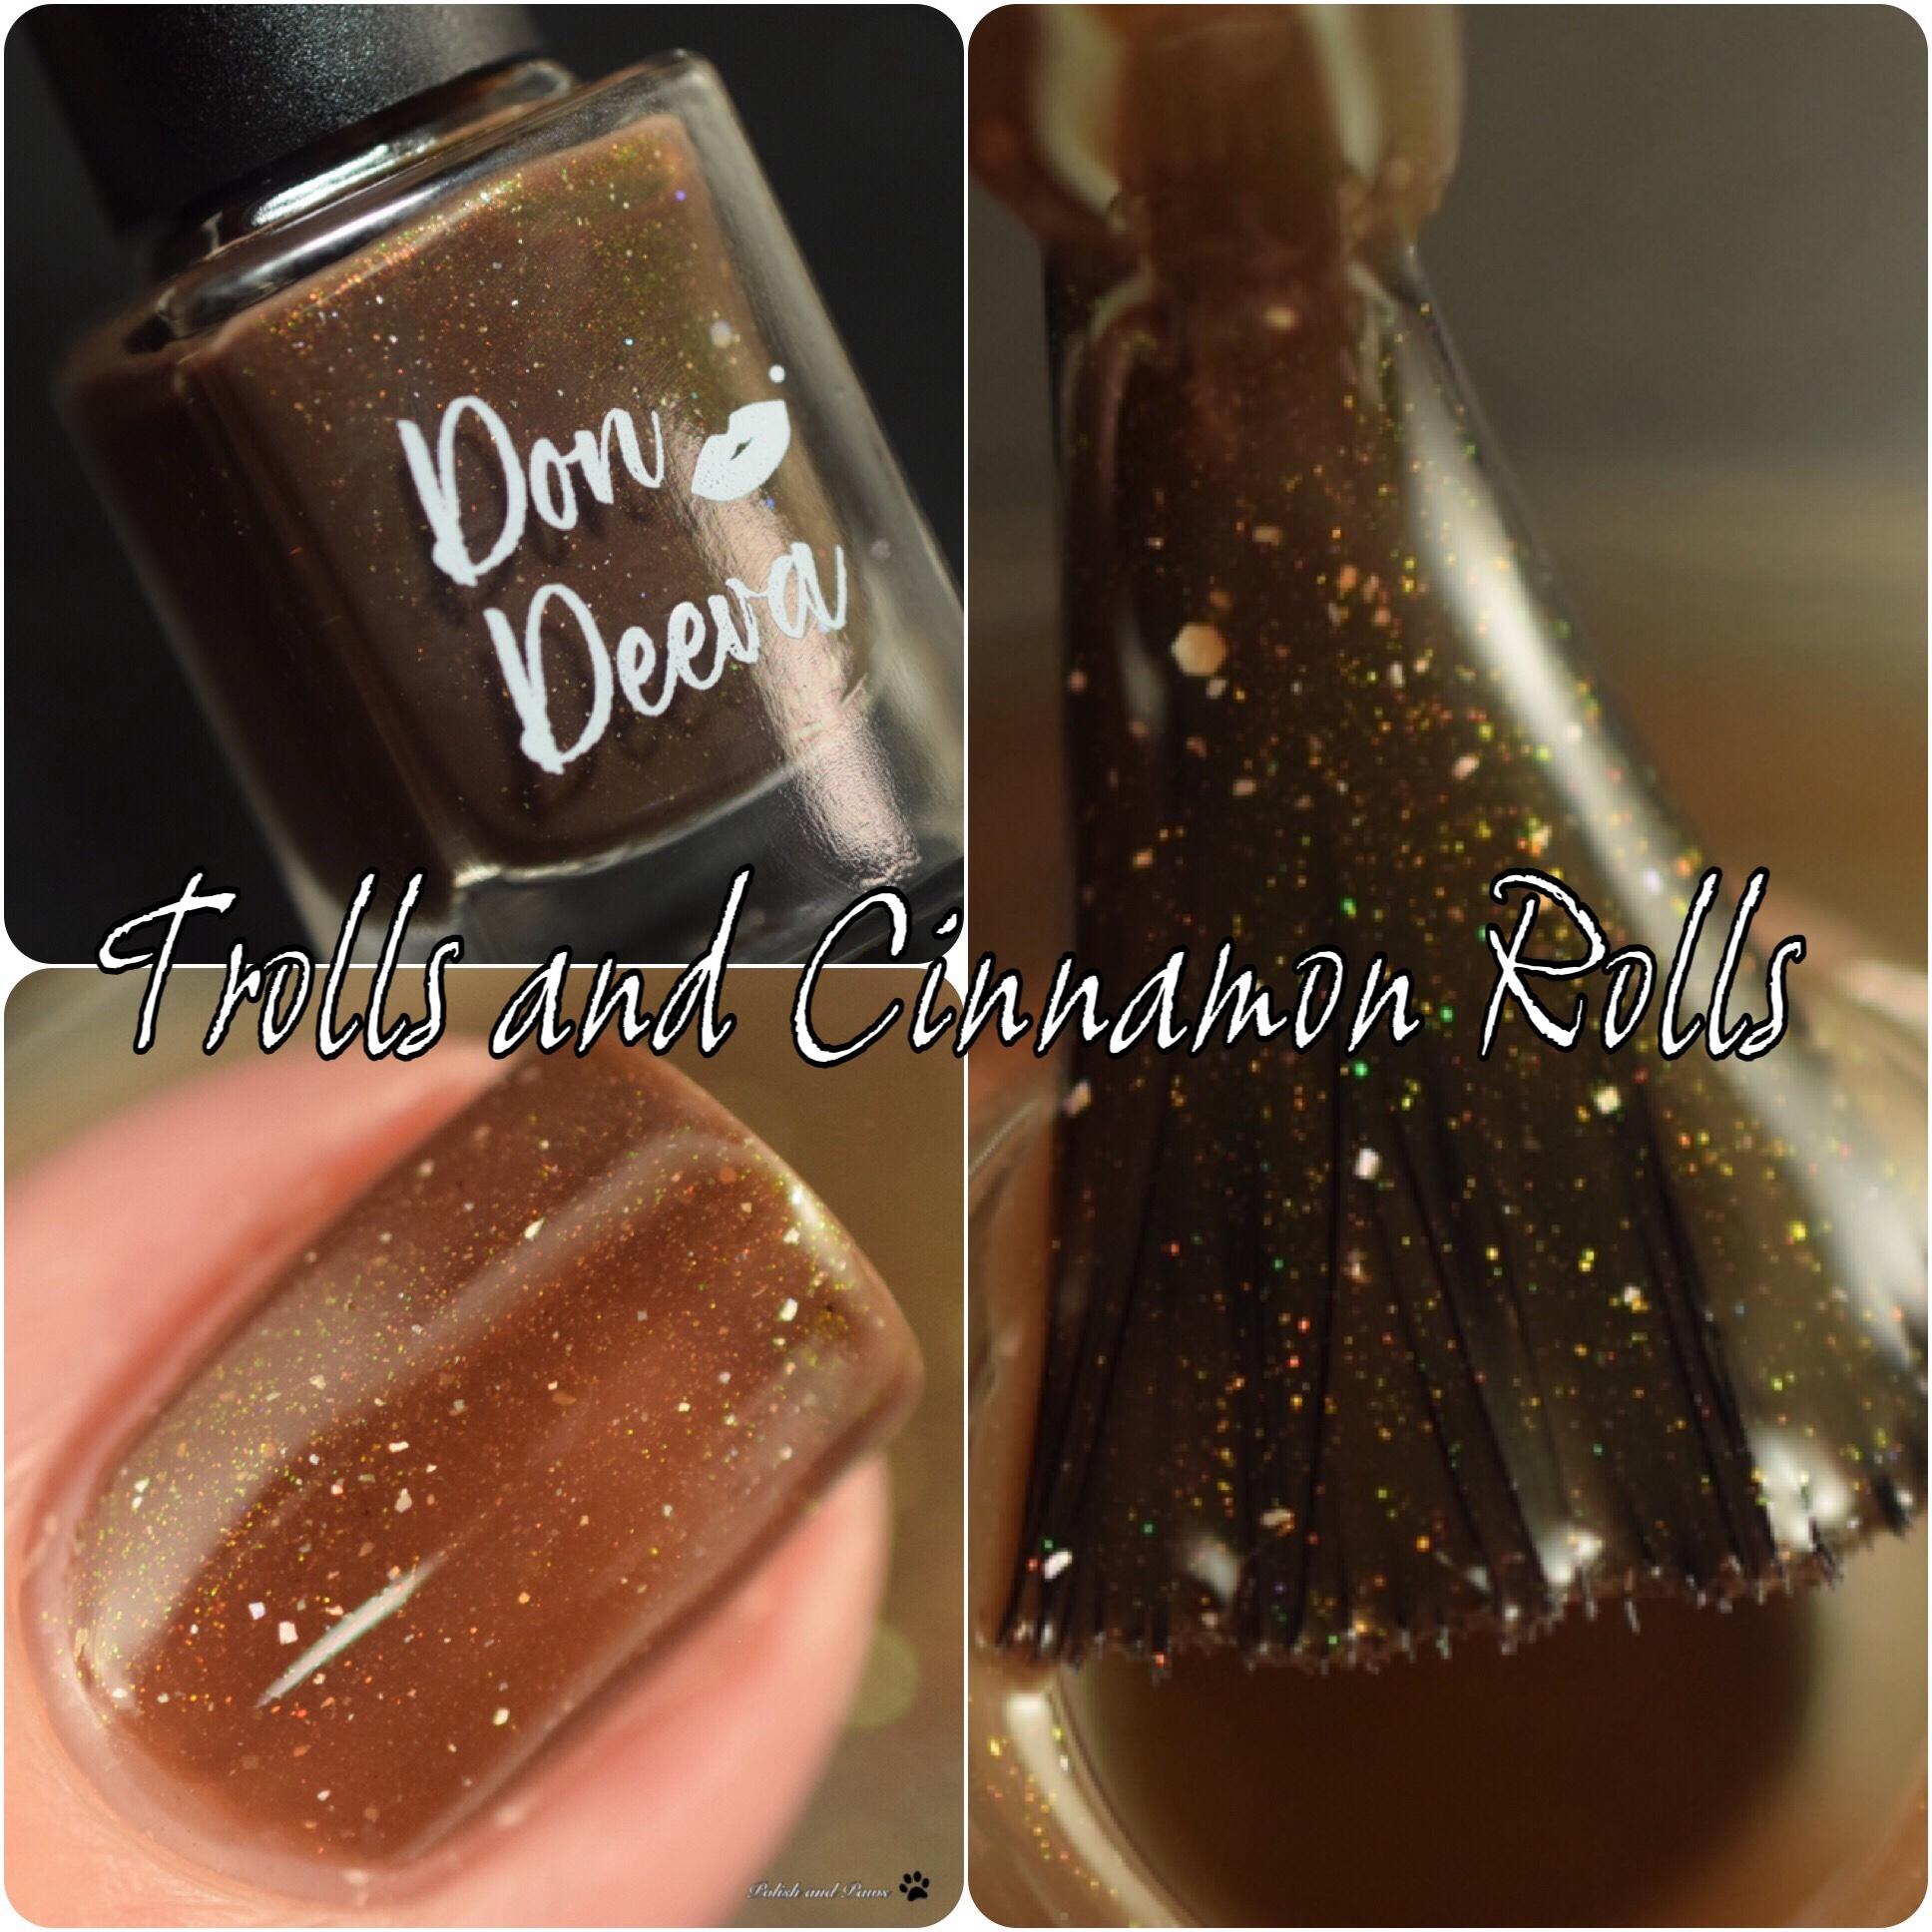 Don Deeva Trolls and Cinnamon Rolls